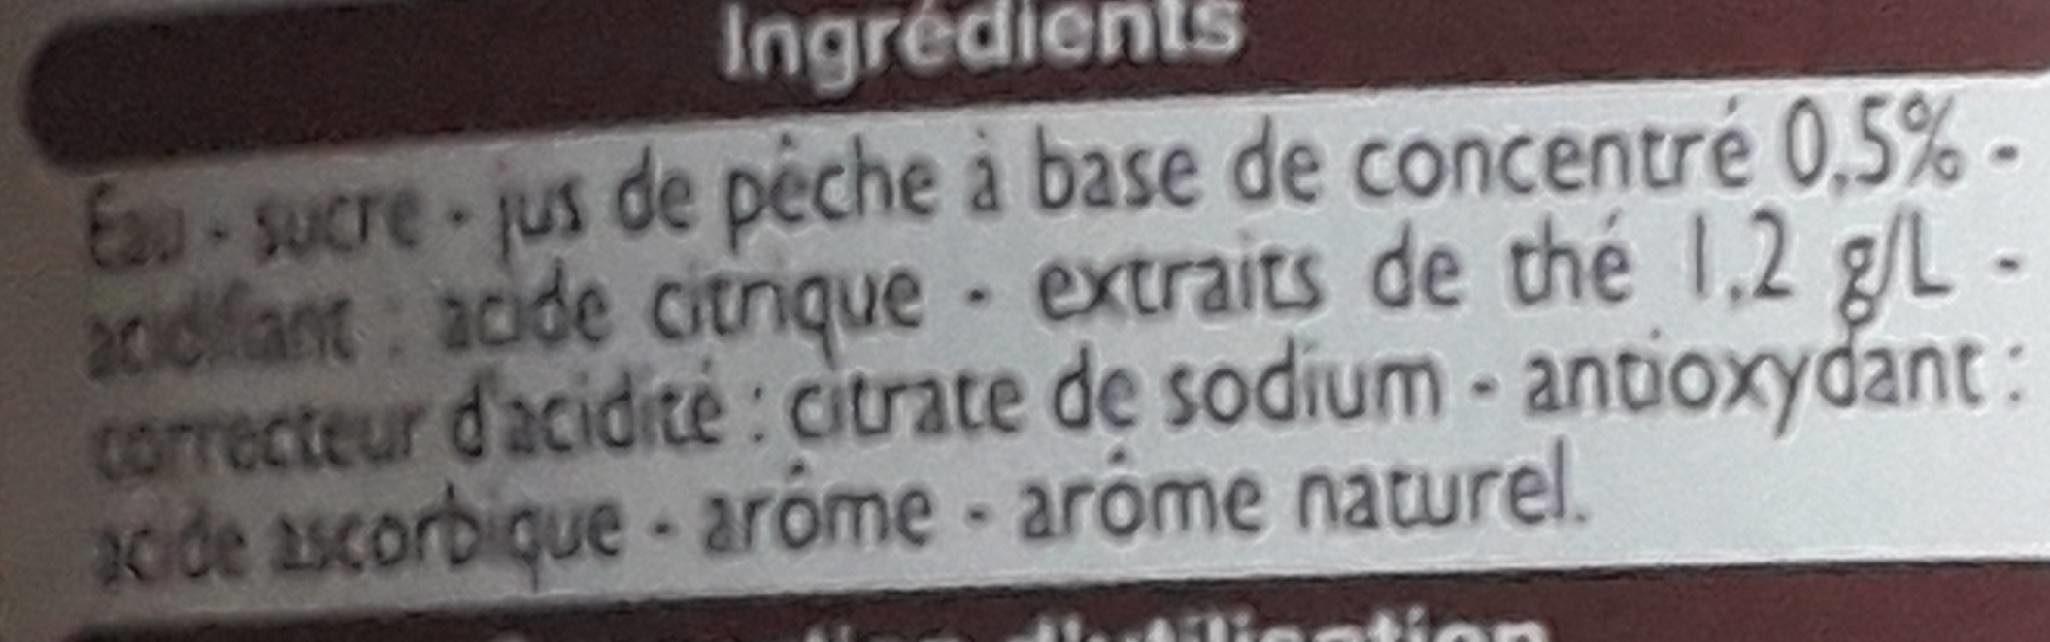 Thé glacé Saveur Pêche - Ingredients - fr